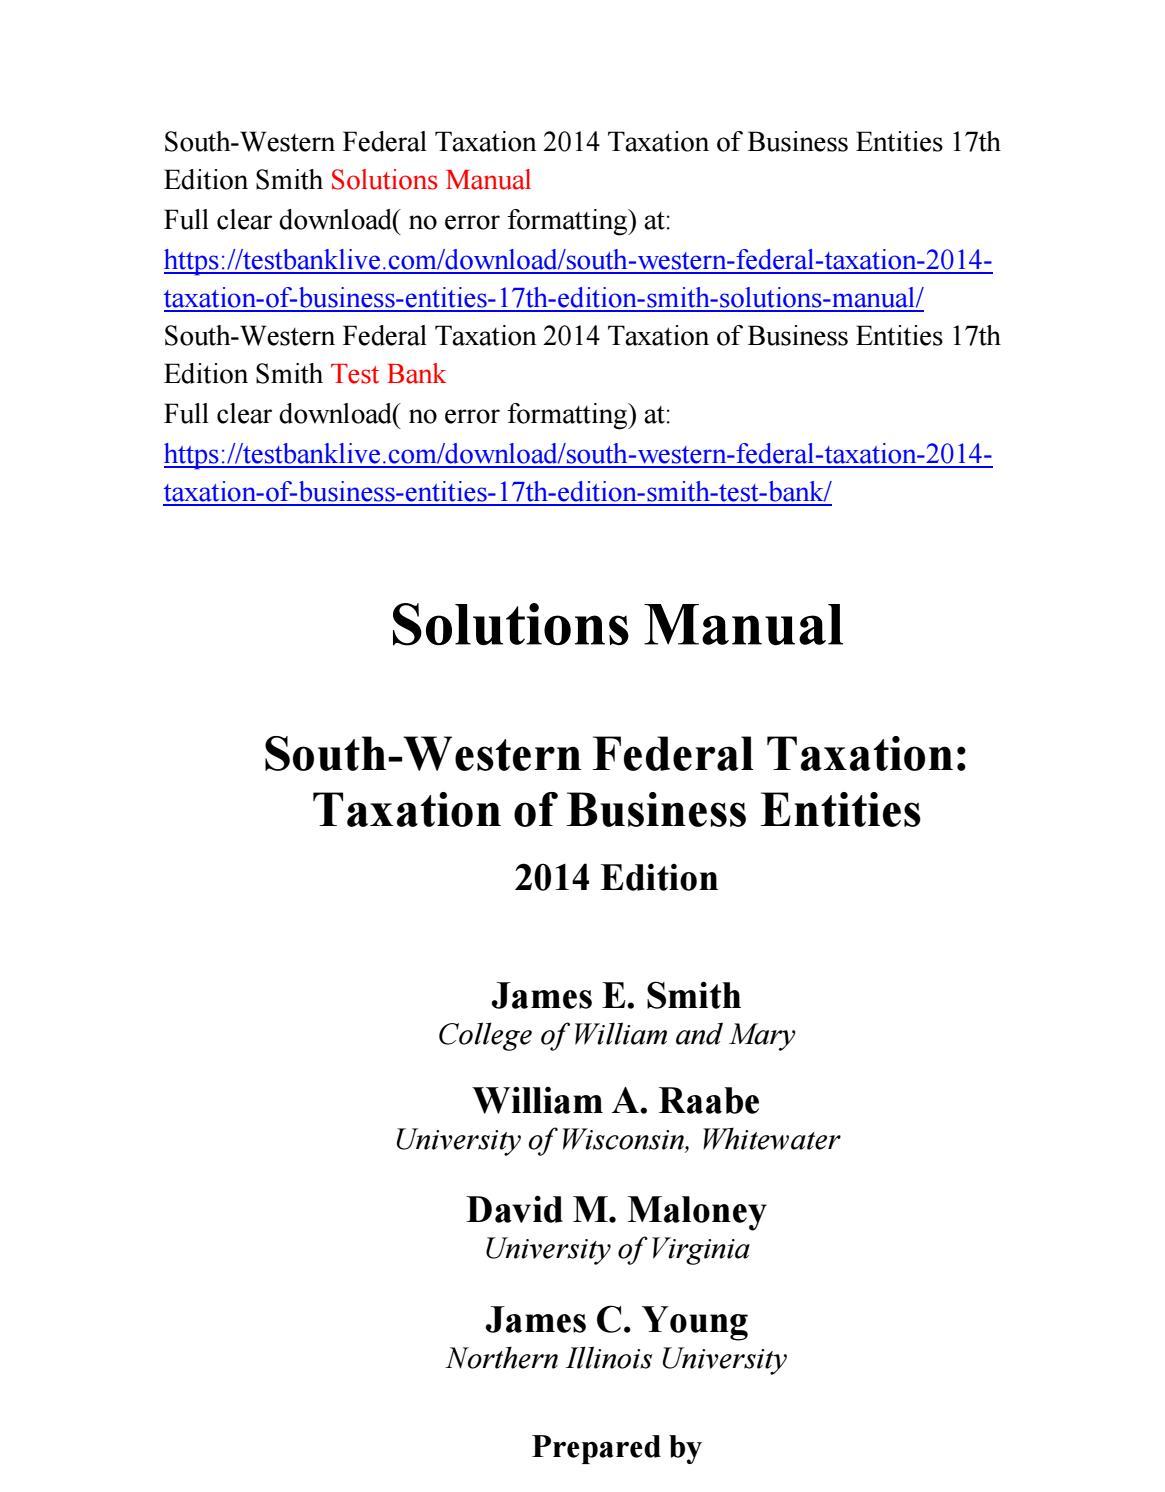 South western federal taxation 2014 taxation of business entities 17th  edition smith solutions manua by Kiotyu282 - issuu